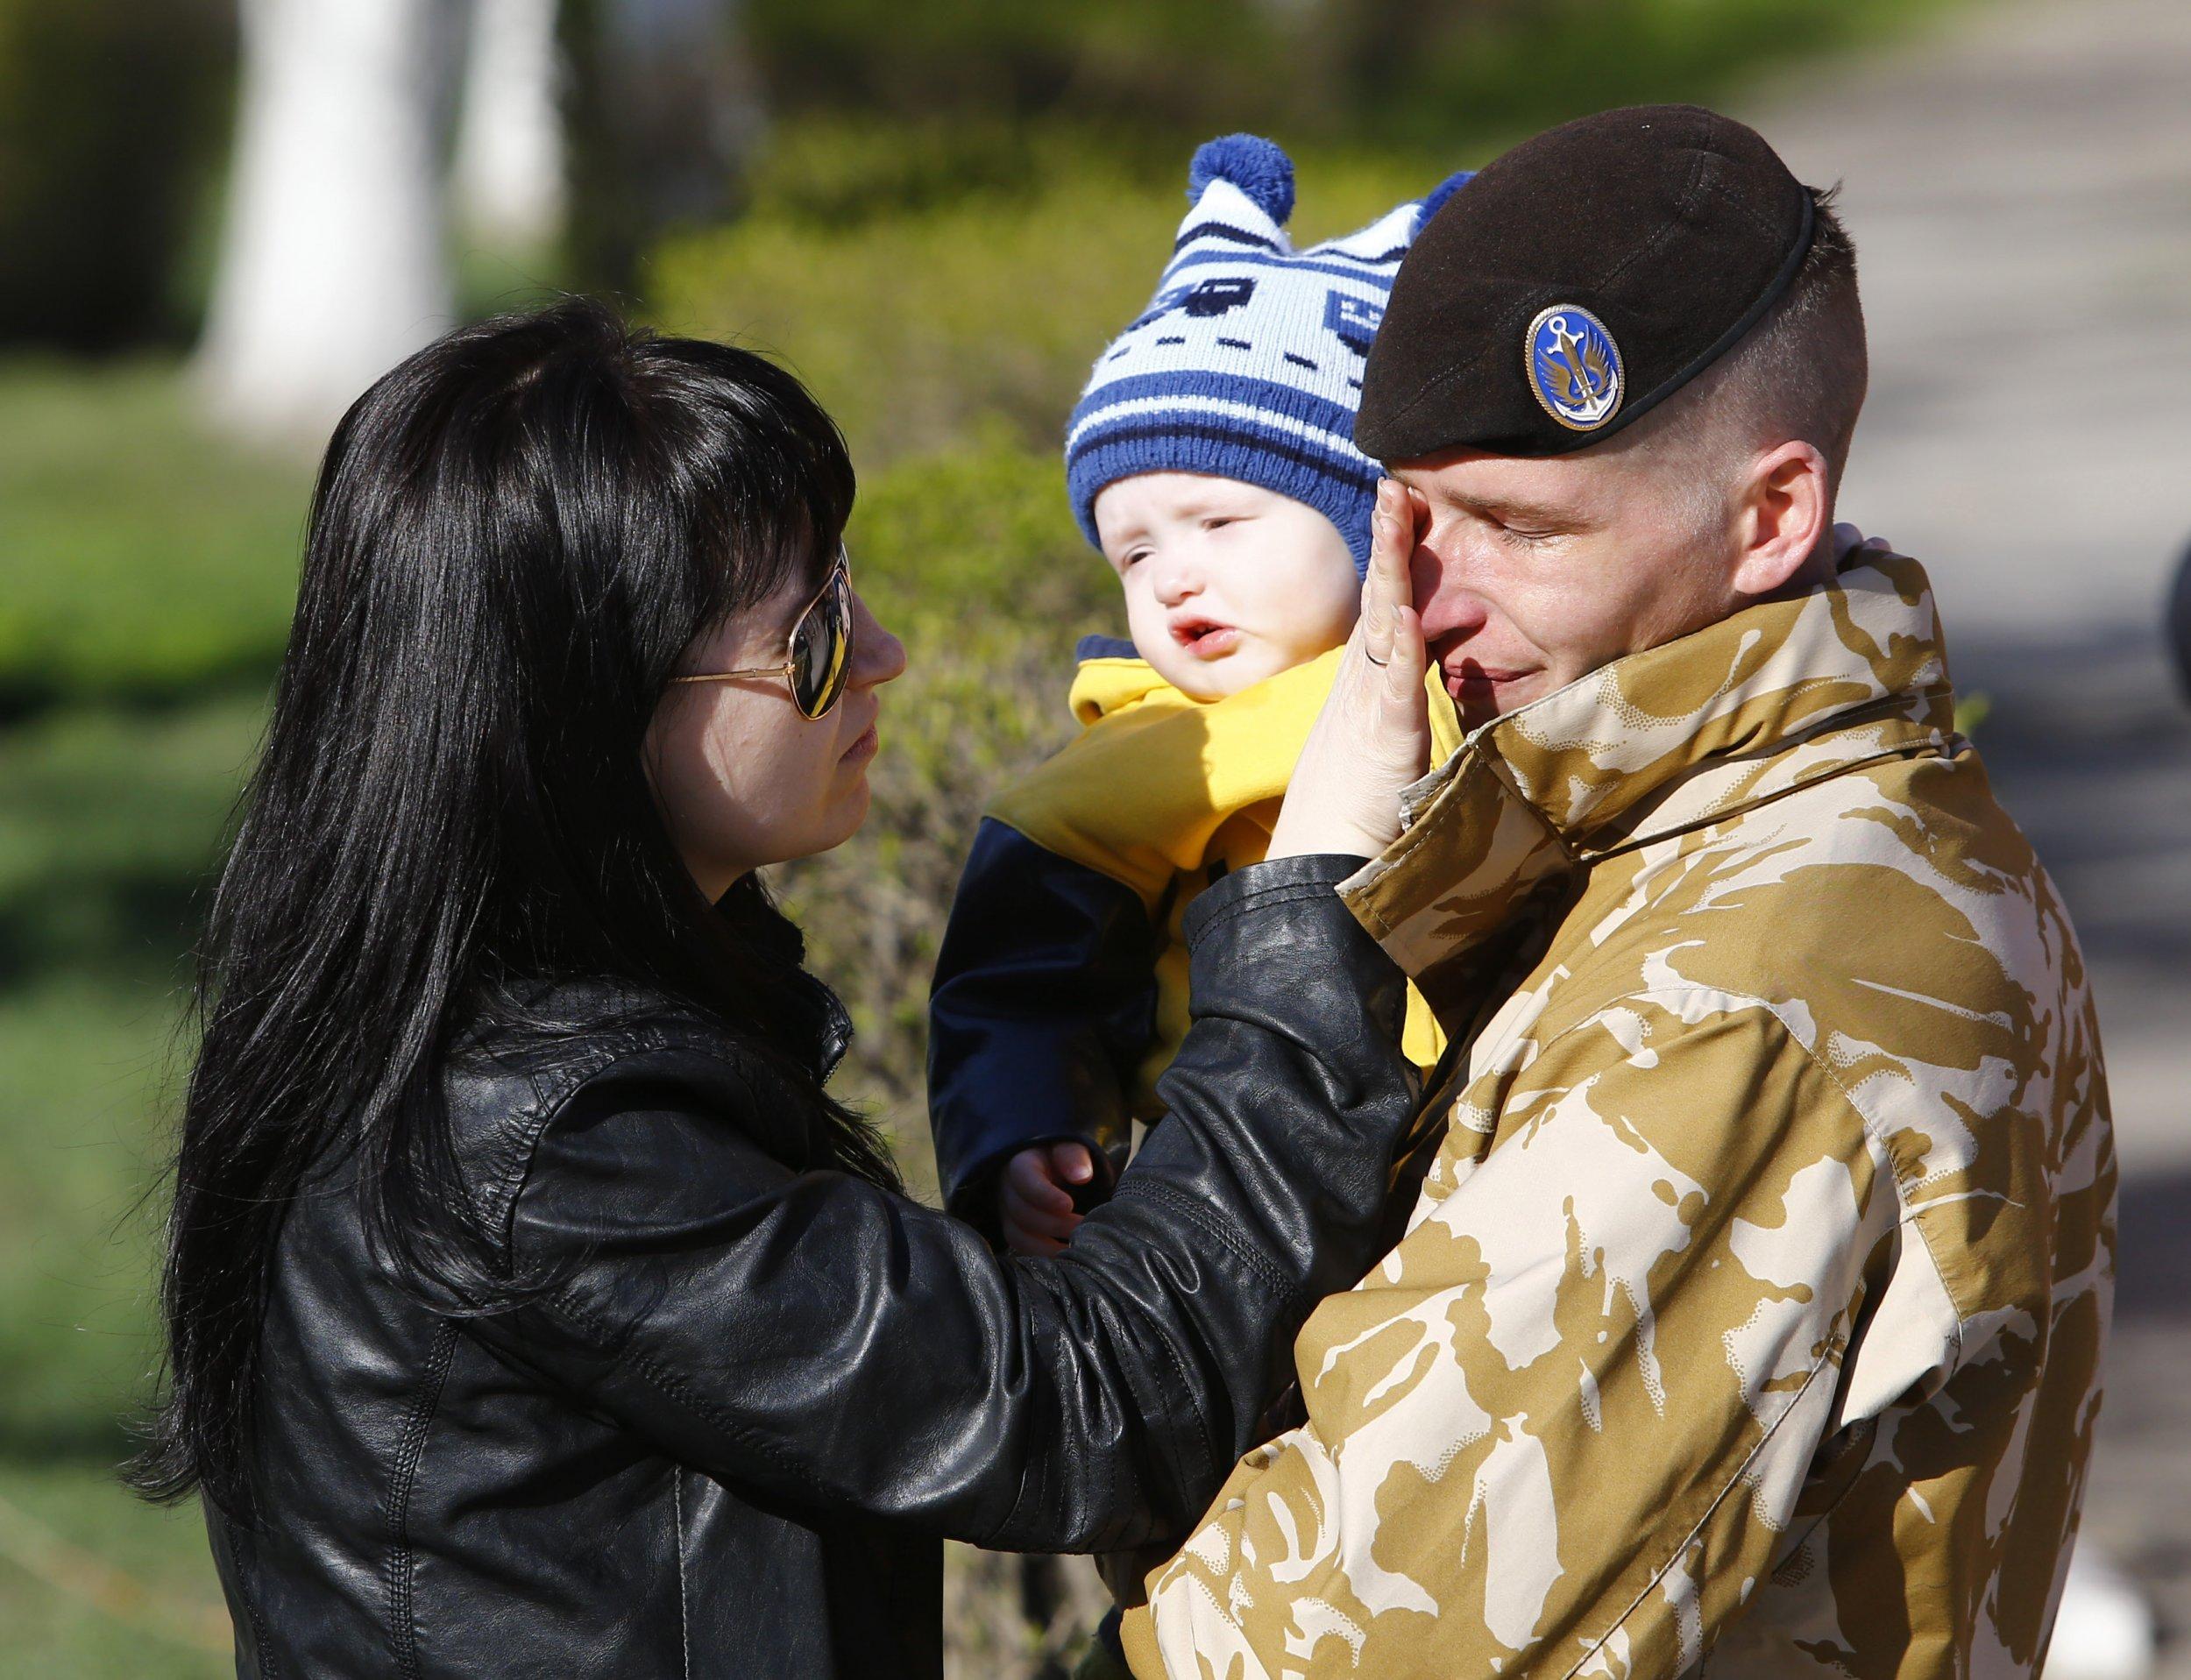 Ukraine evacuation